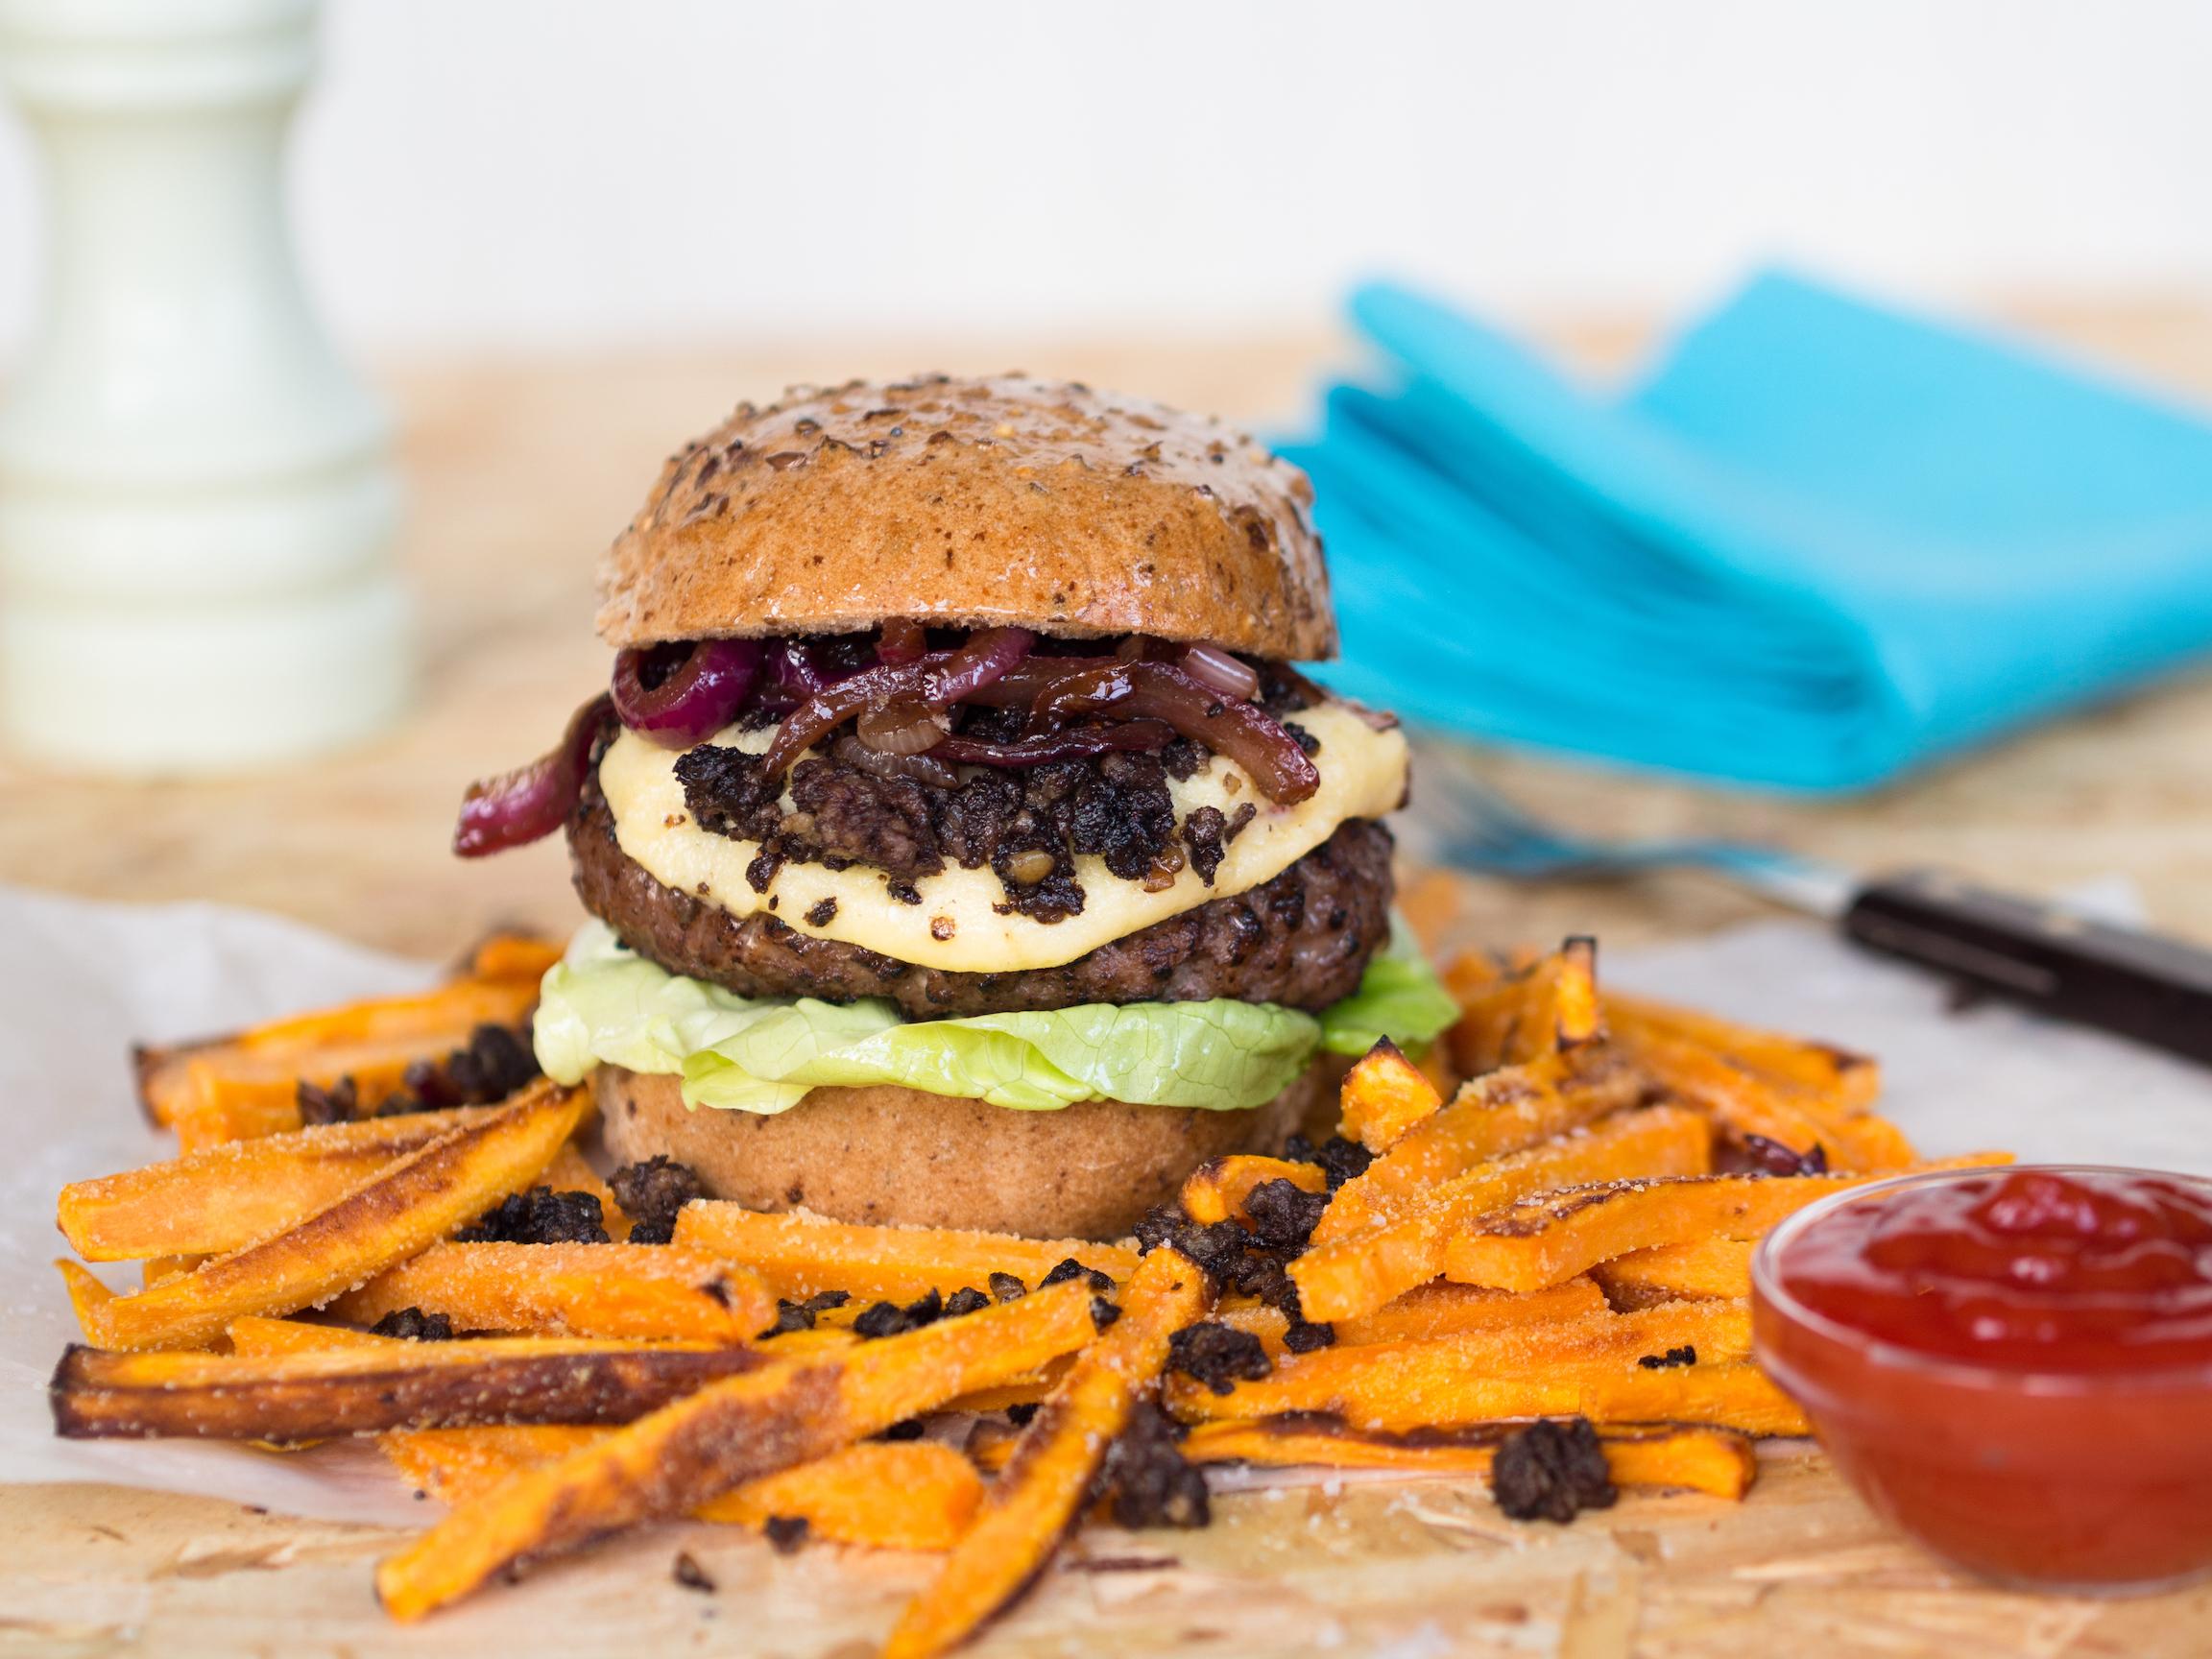 Leckerer Burger - Rezept von Jan-Philipp Cleusters